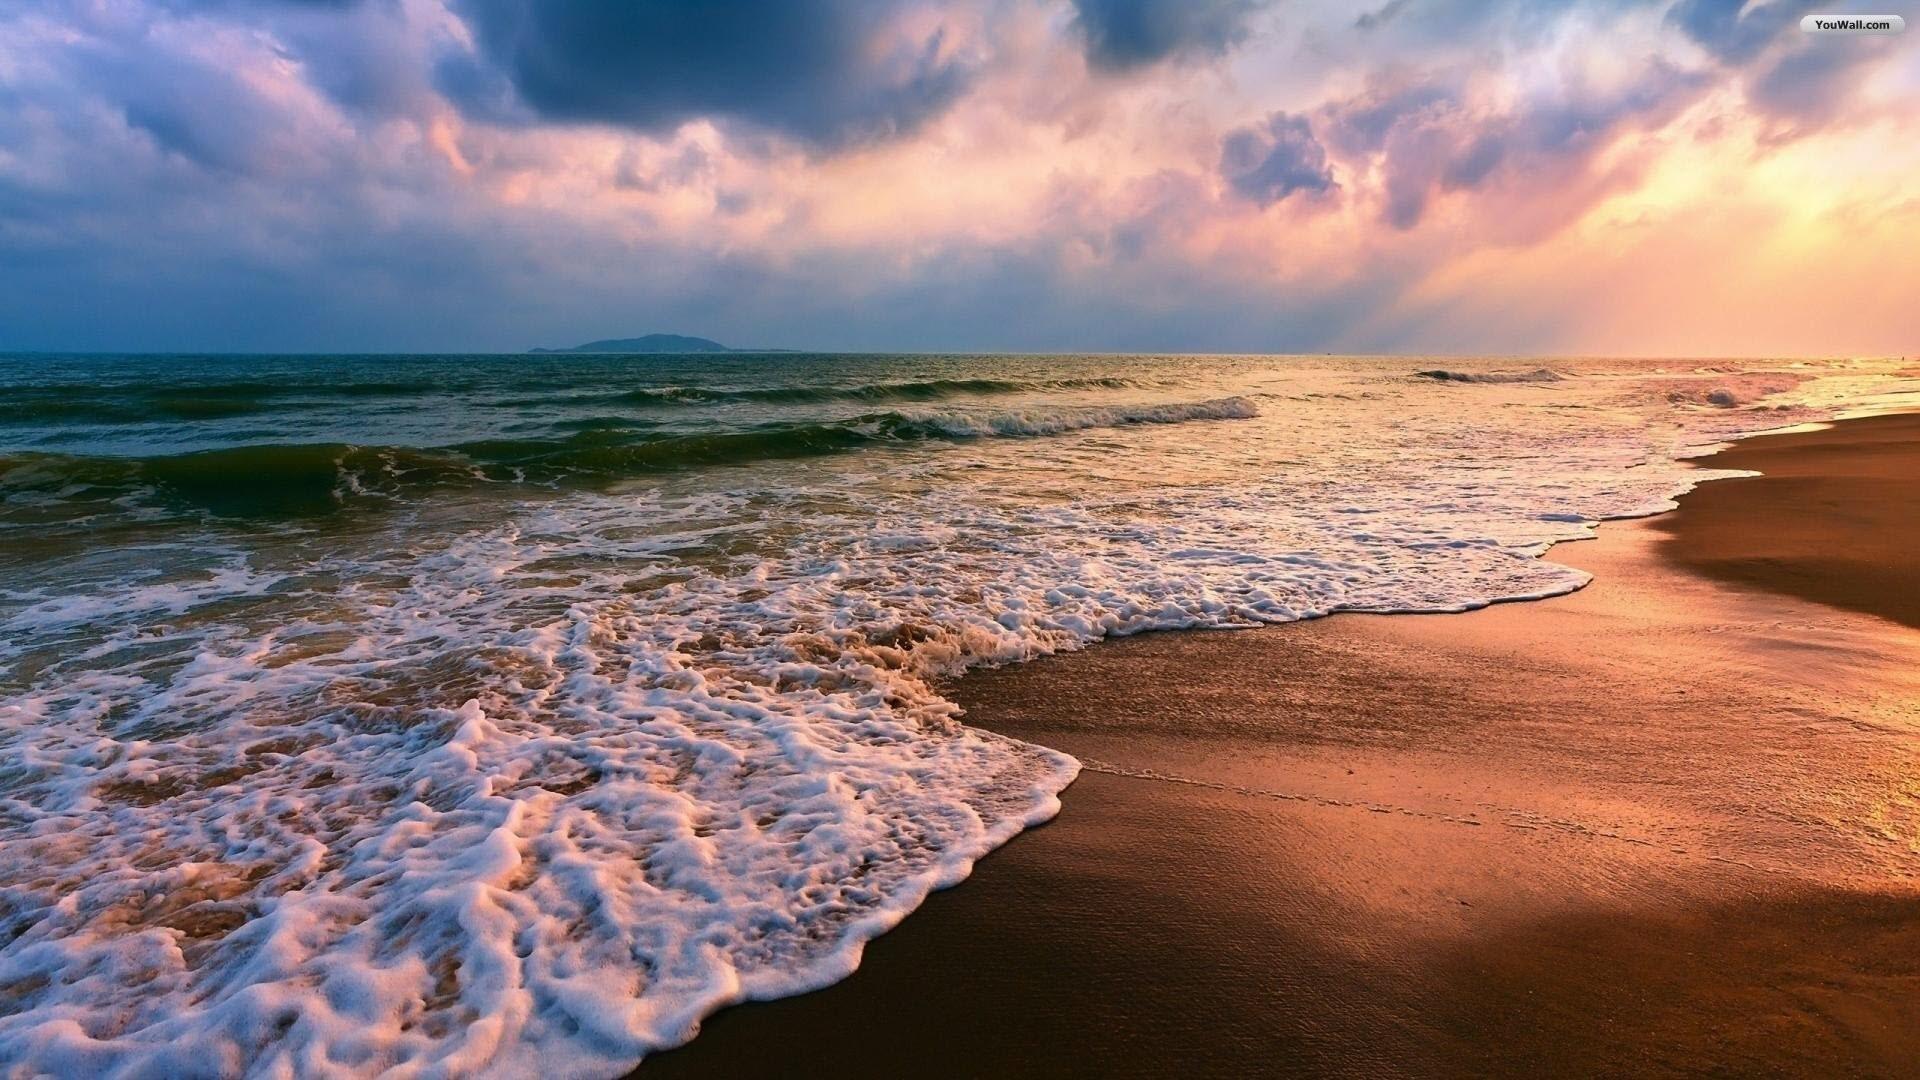 Sea HD Wallpaper